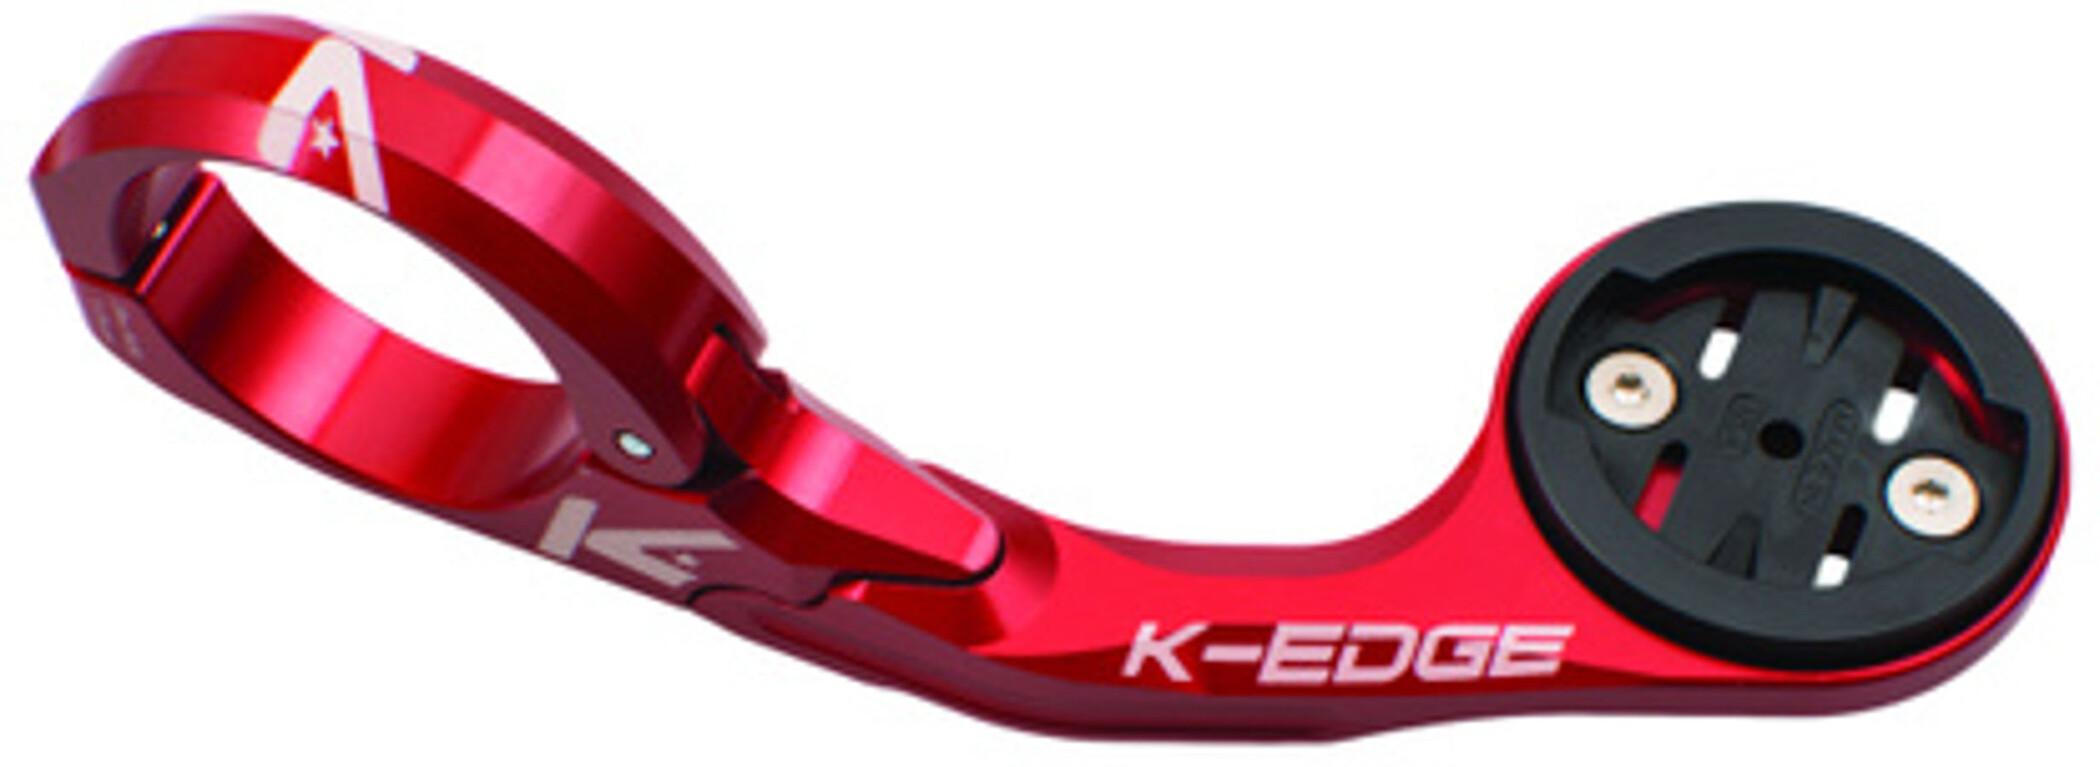 K-EDGE Garmin Pro XL Combo Styrmontering, red | Cykelcomputere